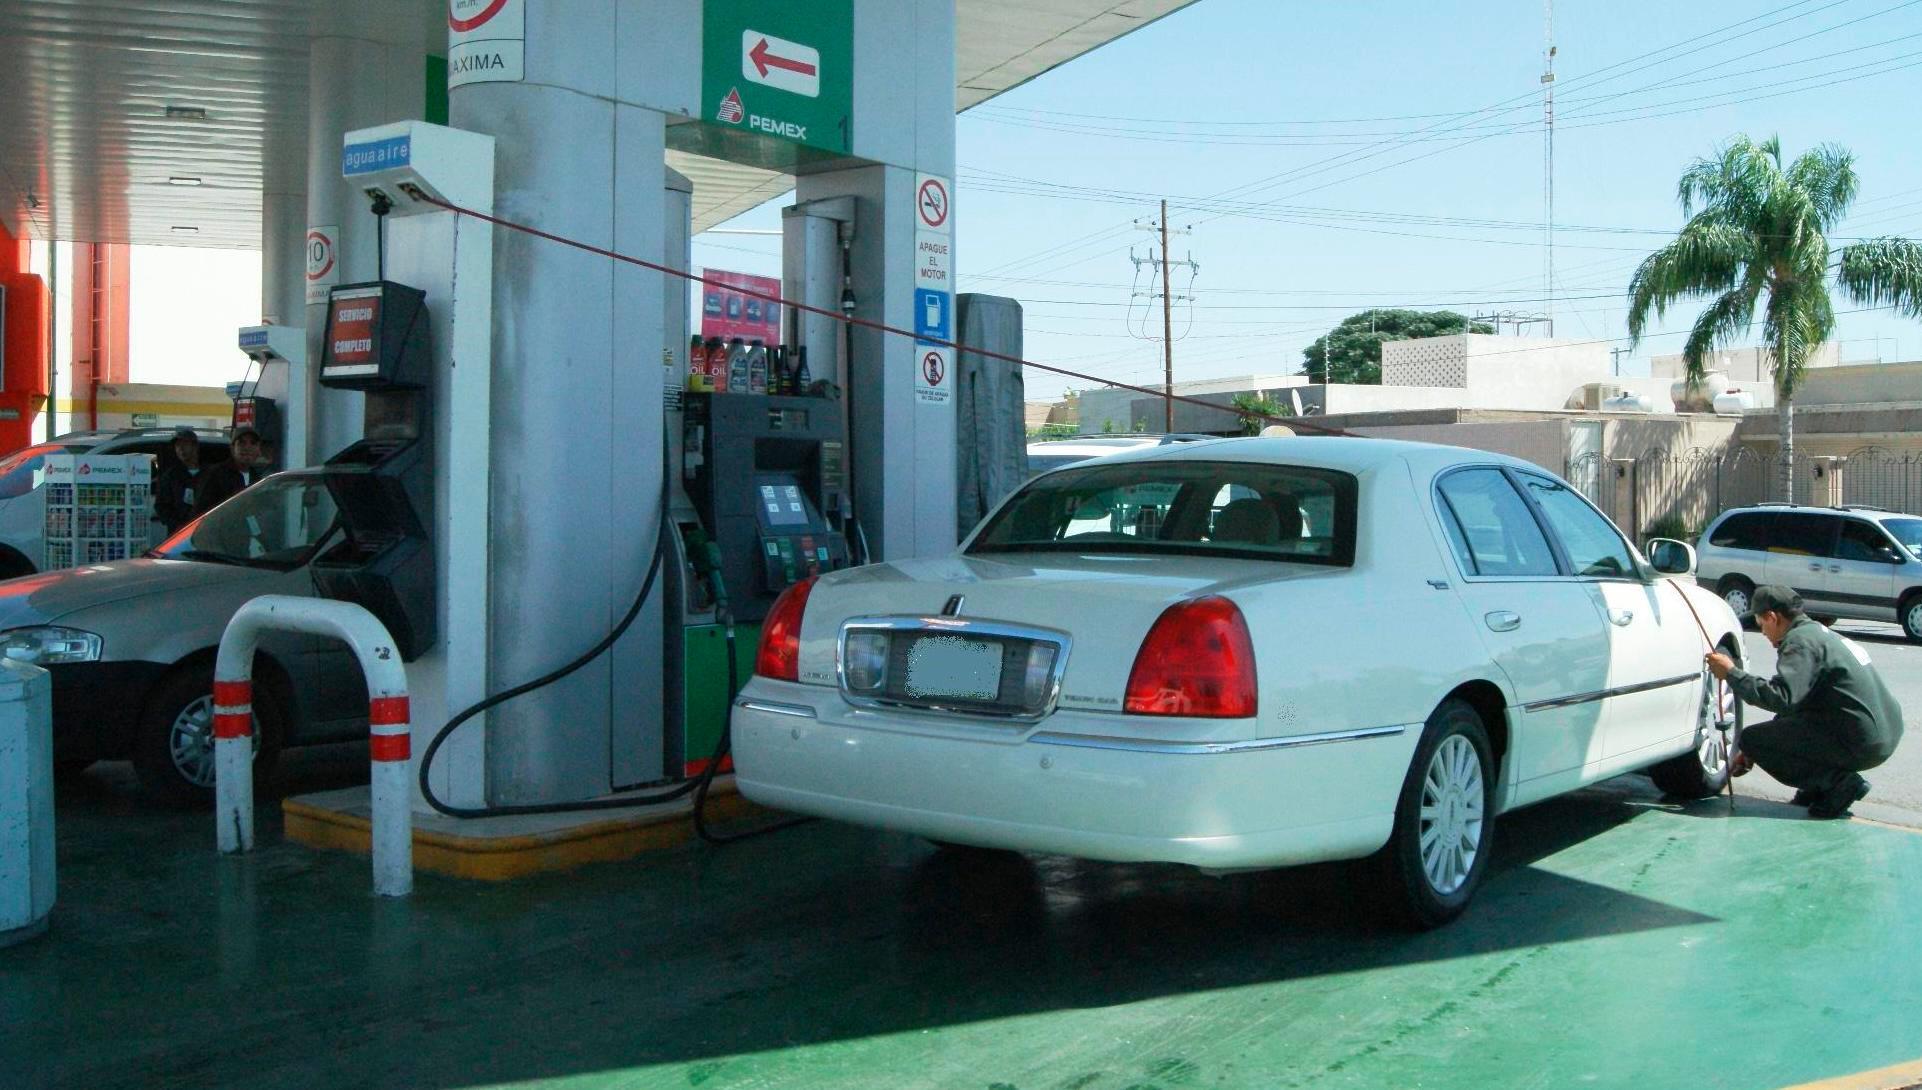 In Gómez, gasoline has risen 1.4% per liter